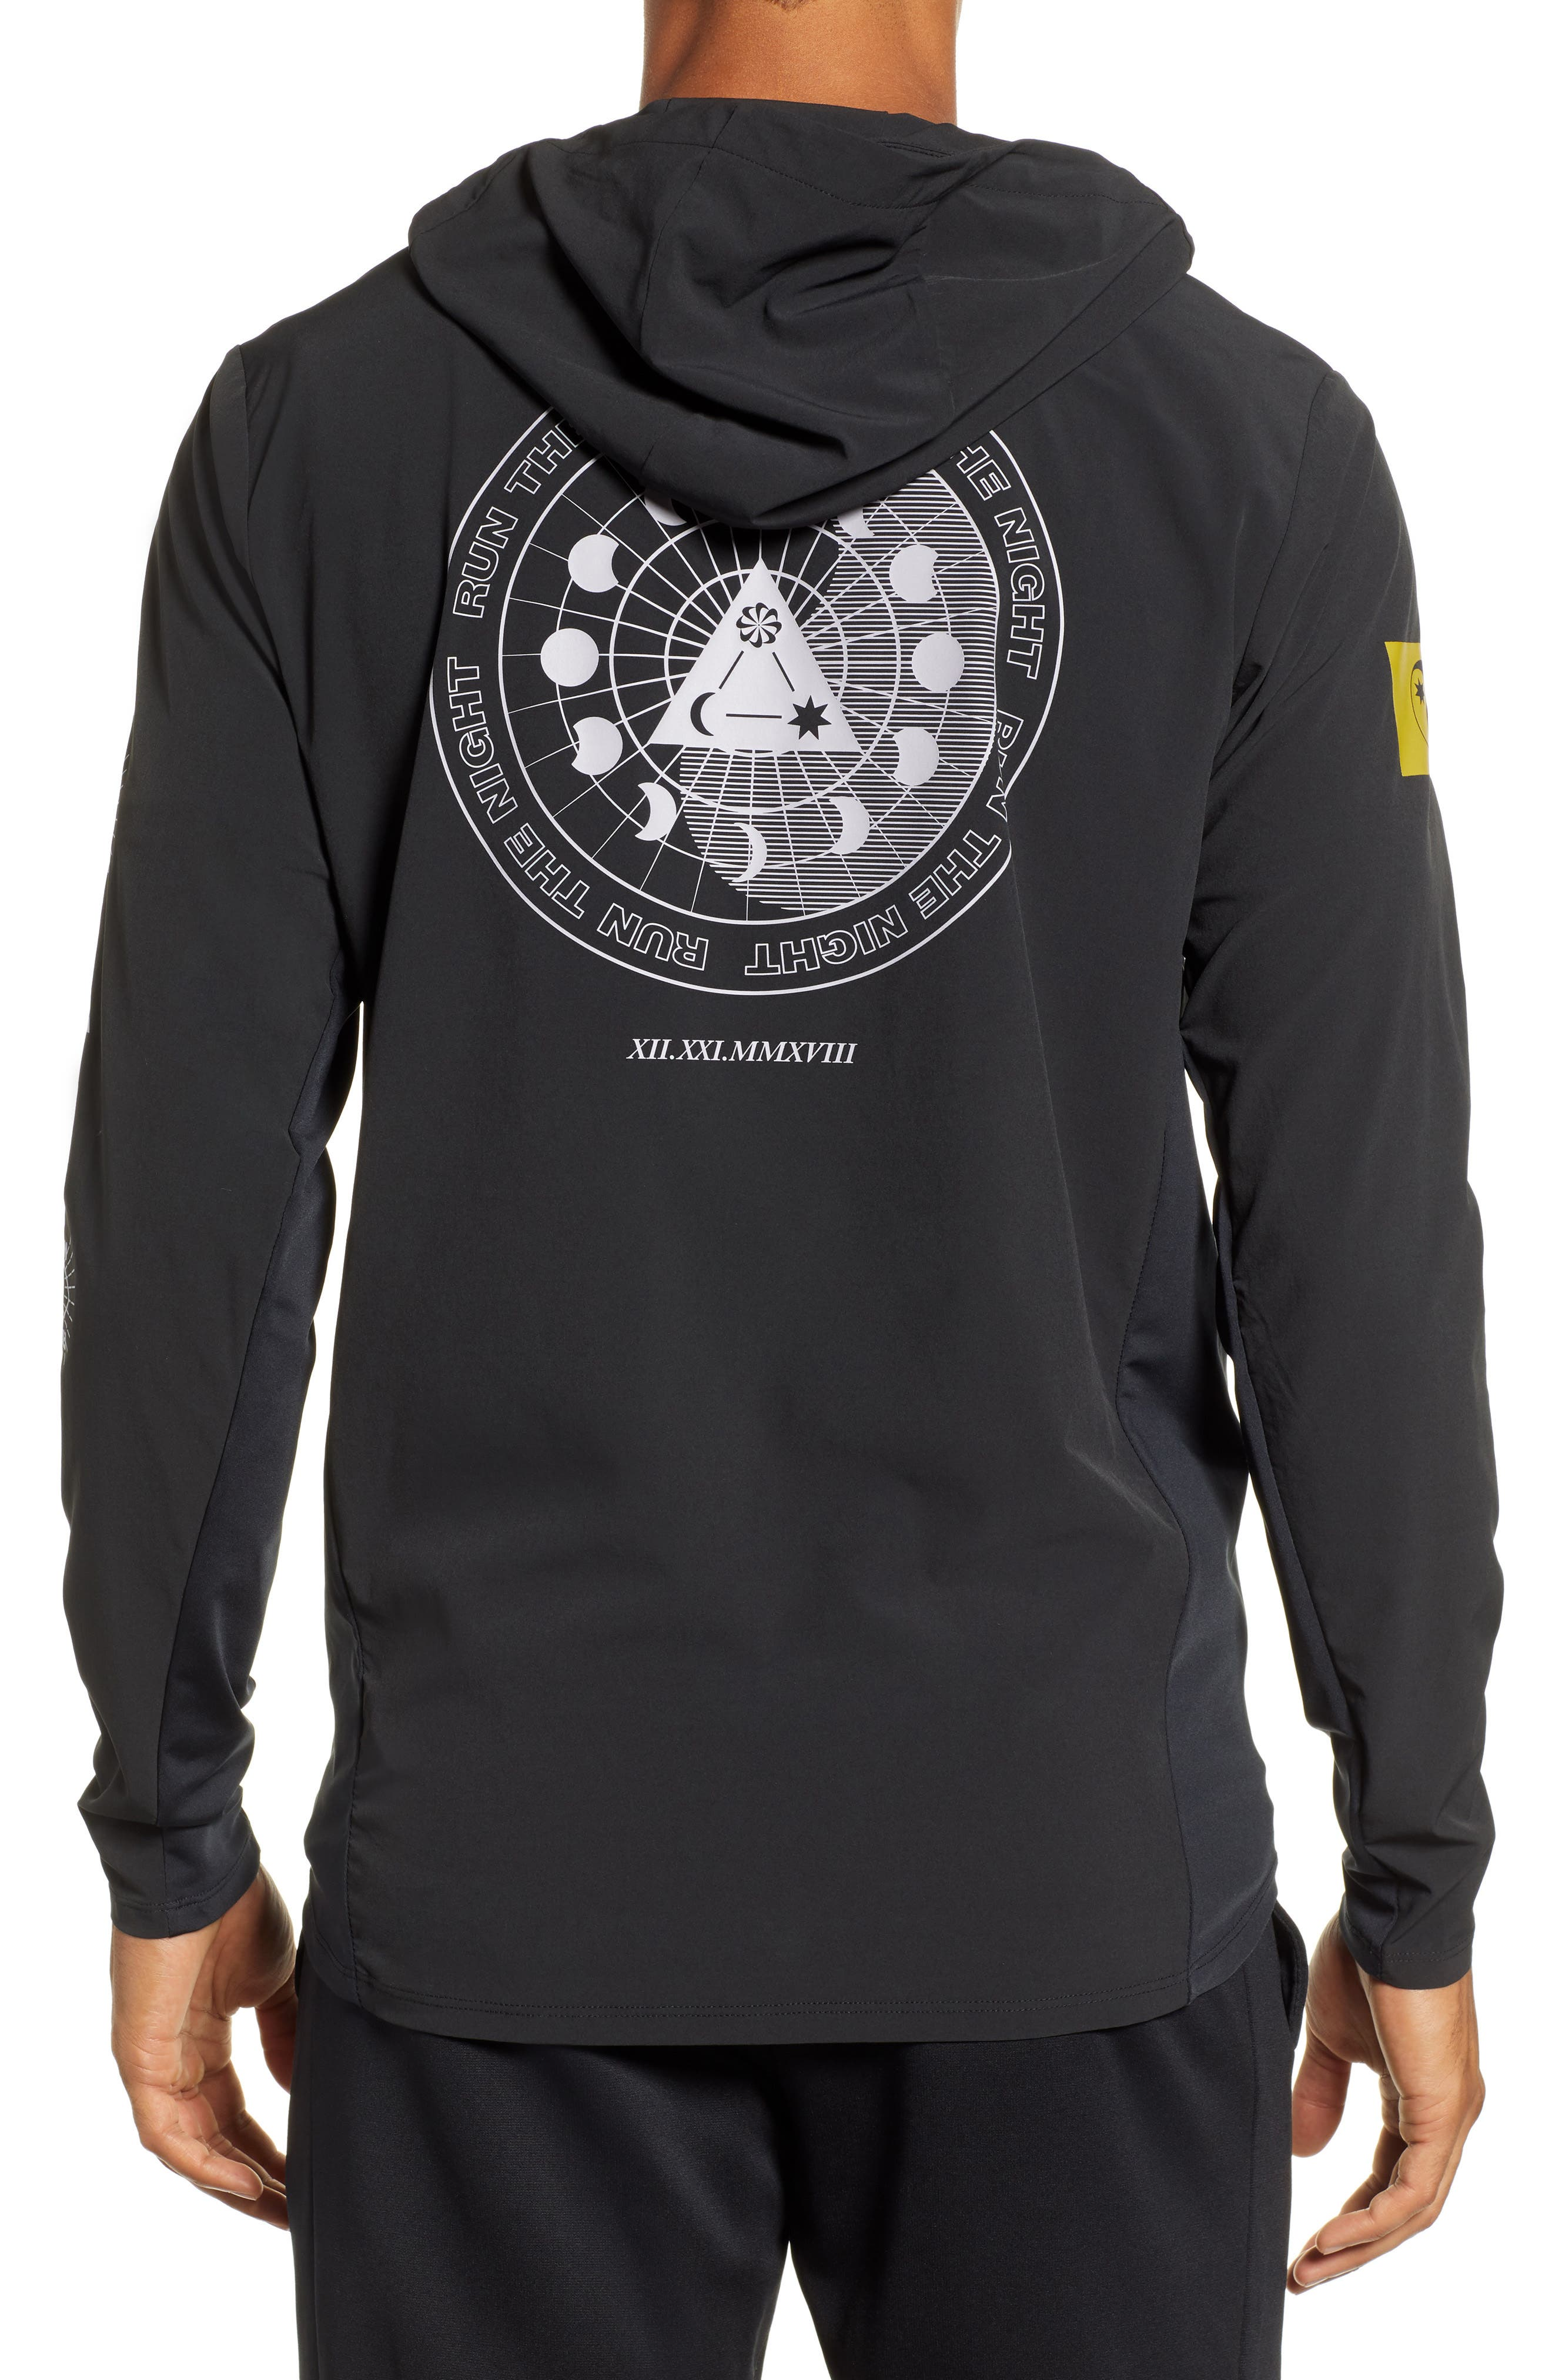 Winter Solstice Reflective Running Jacket,                             Alternate thumbnail 2, color,                             BLACK/ PROVENCE PURPLE